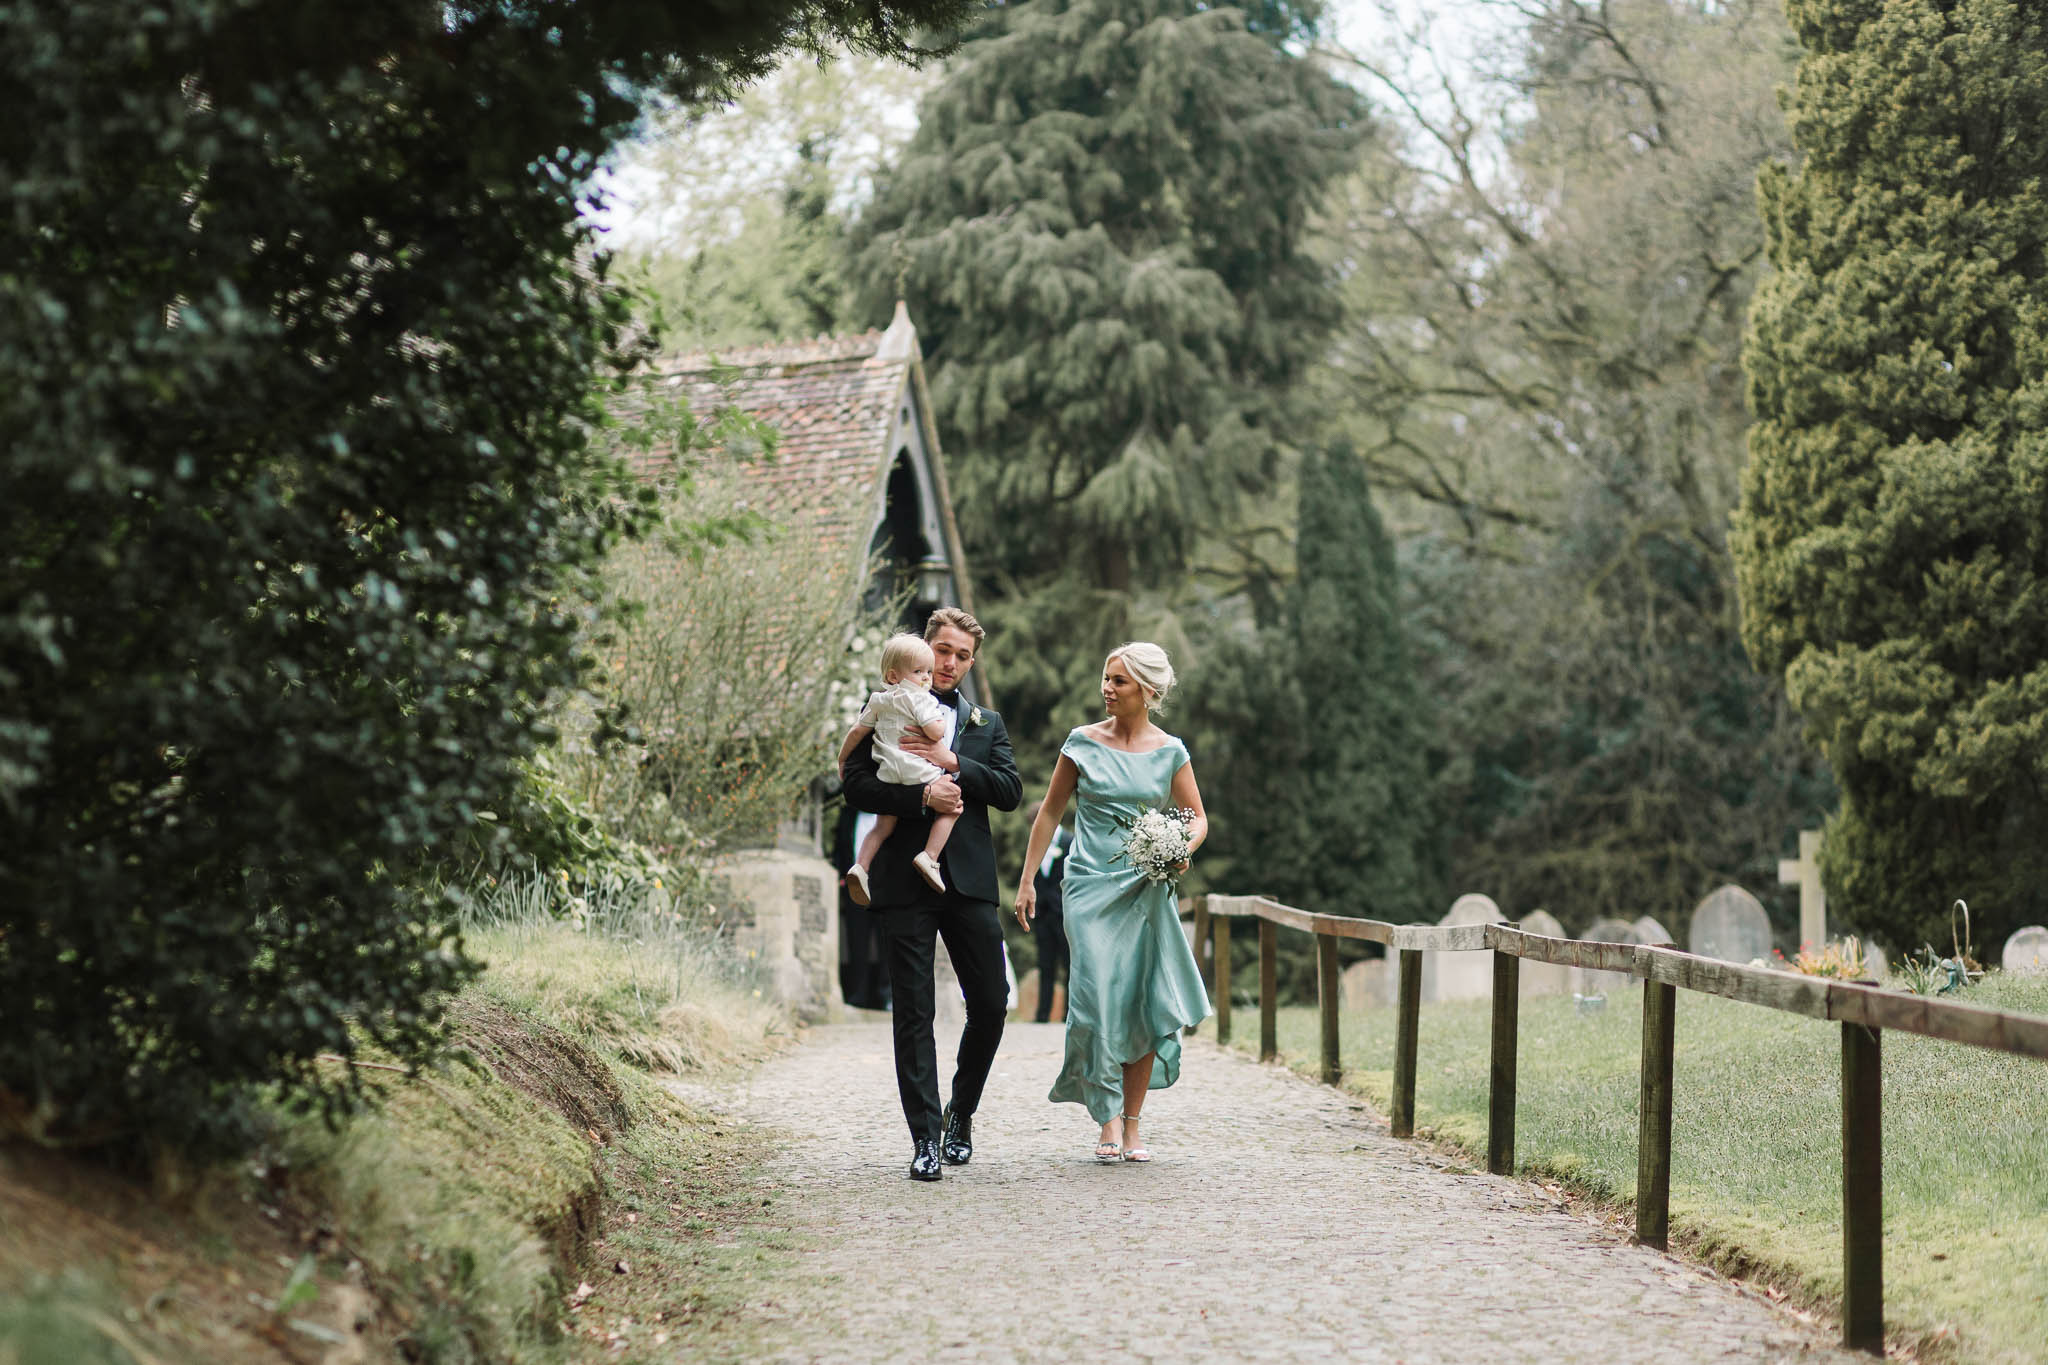 family walking together at church wedding